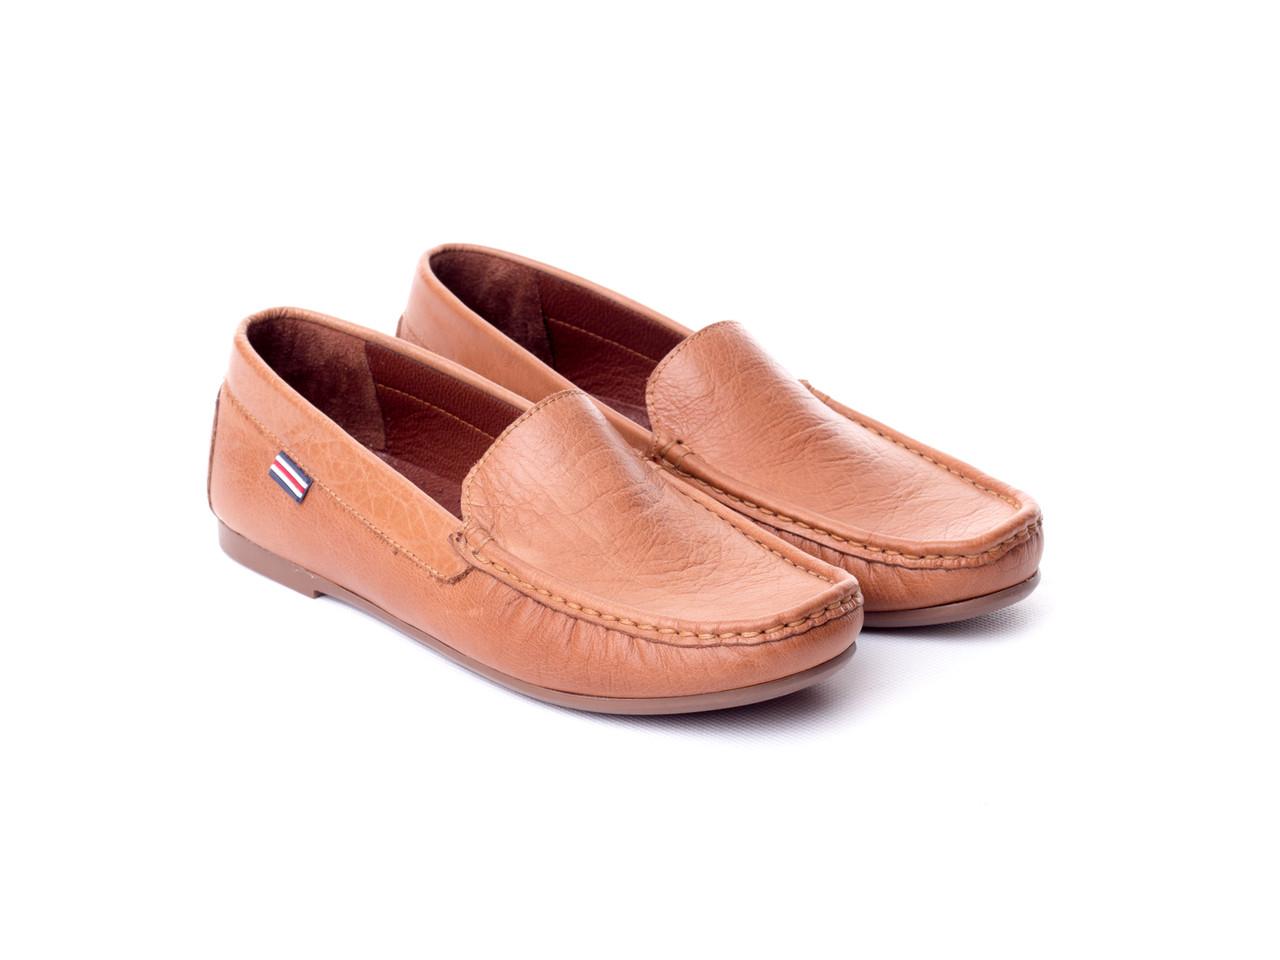 Мокасини Etor 2755-7027-2 40 коричневі